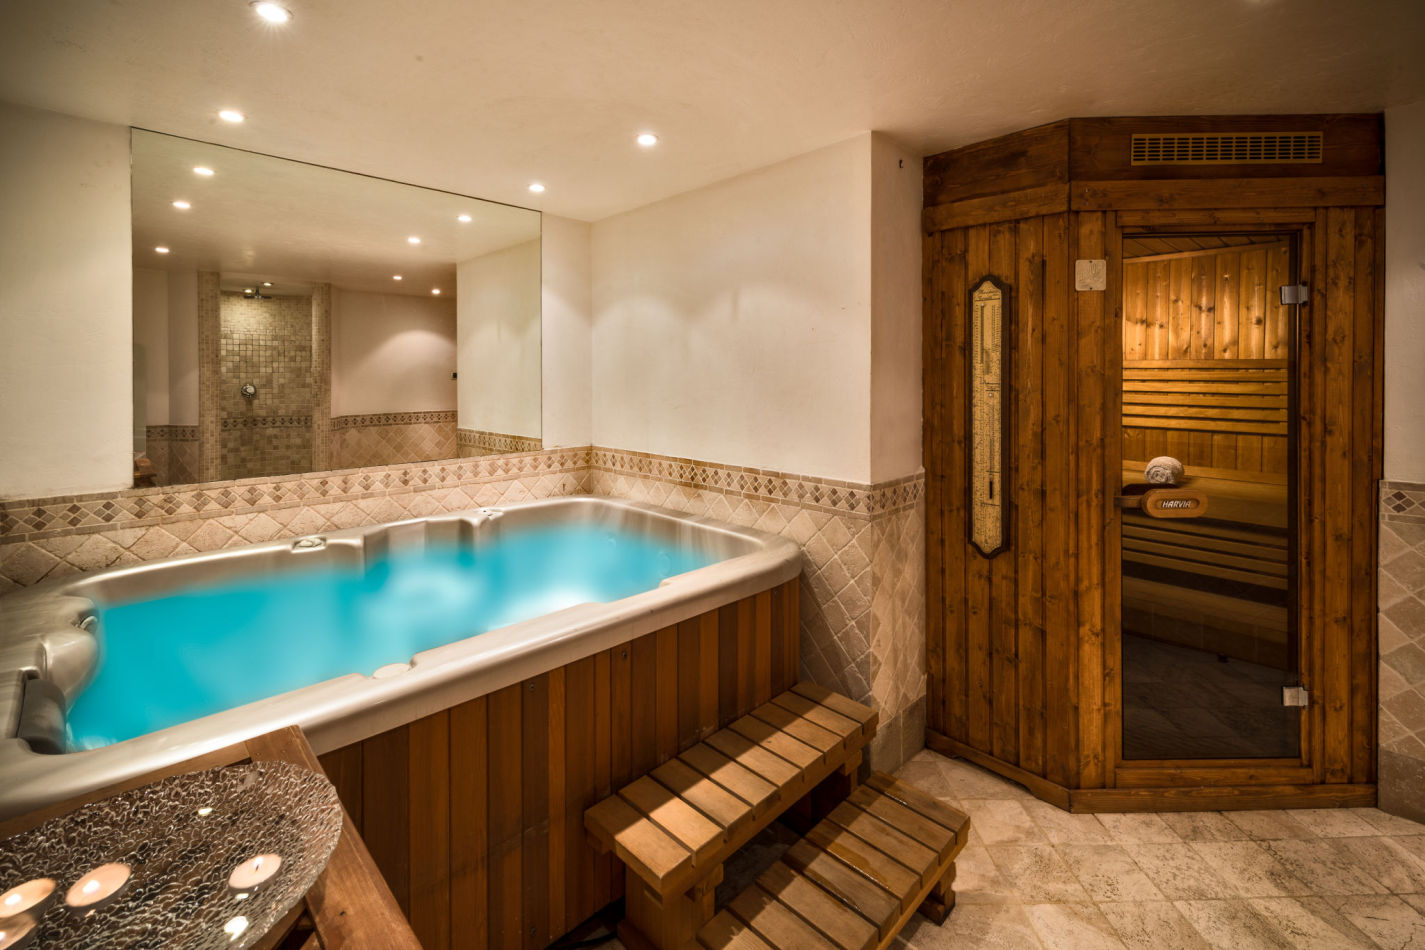 chalet-hermine-hot-tub